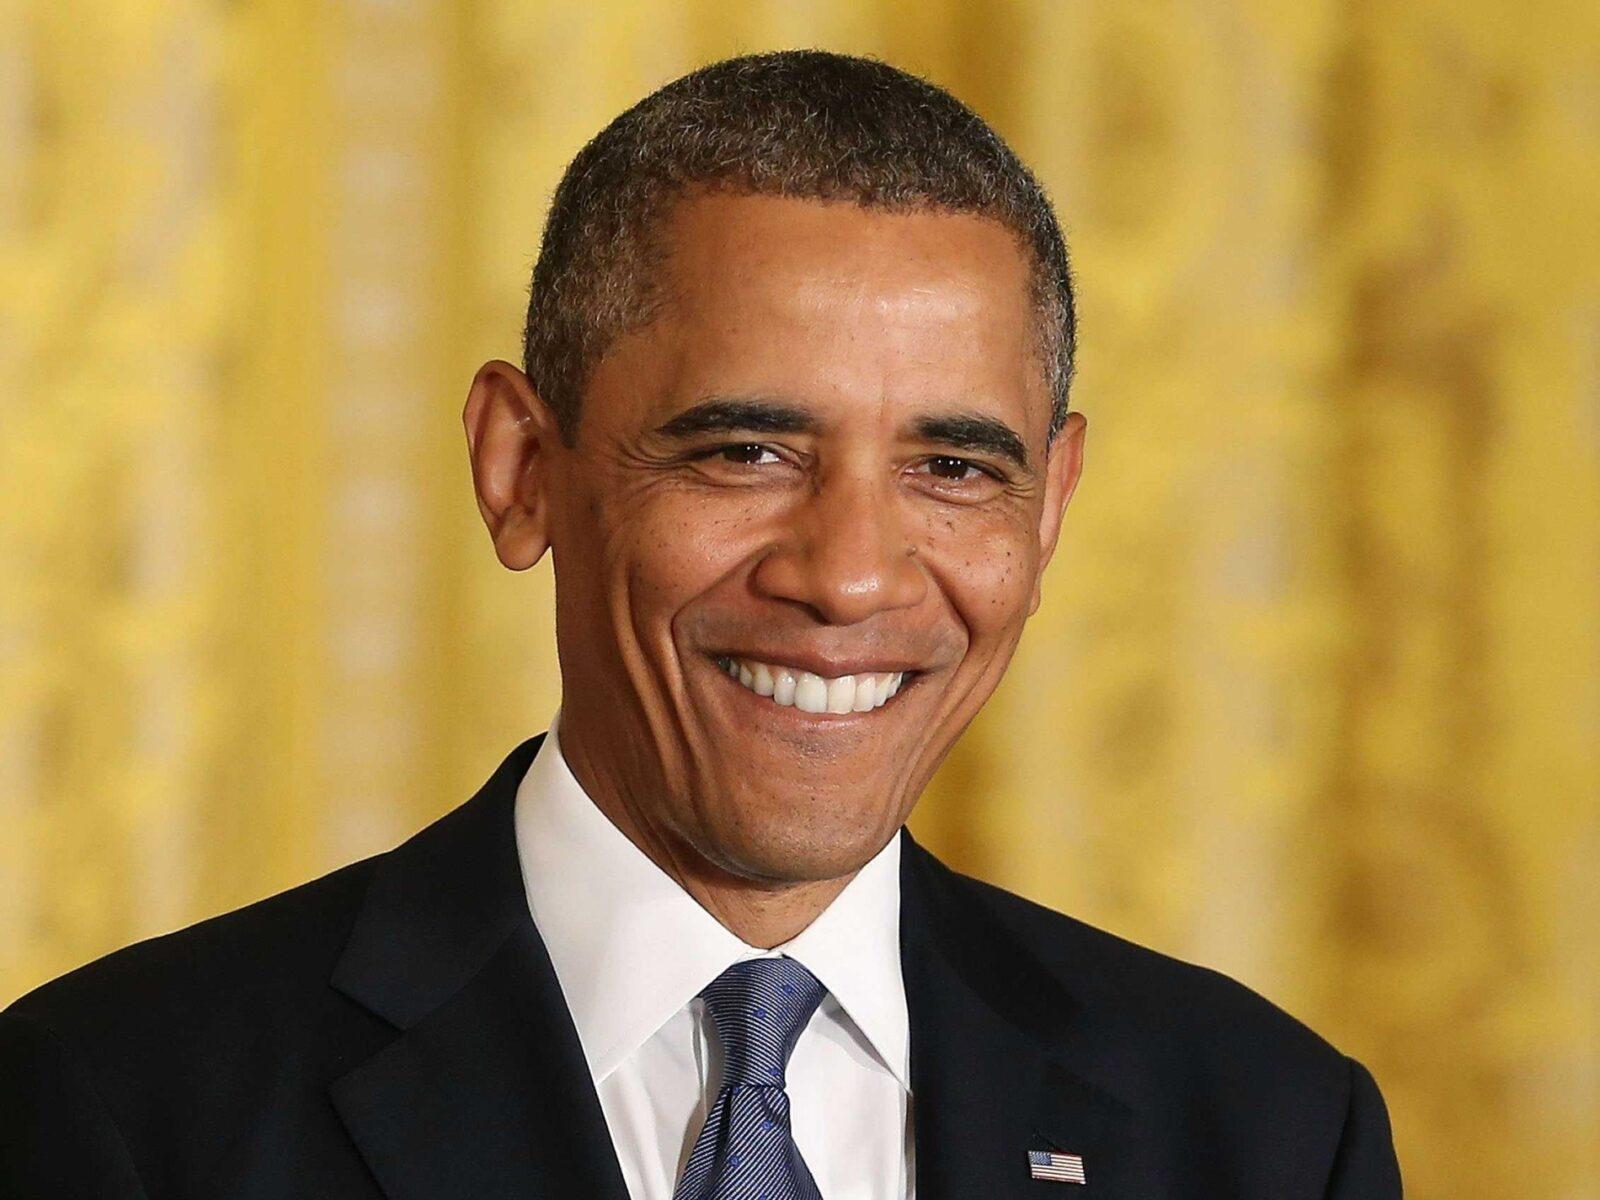 Obama Shocks Racists in Fascinating Podcast